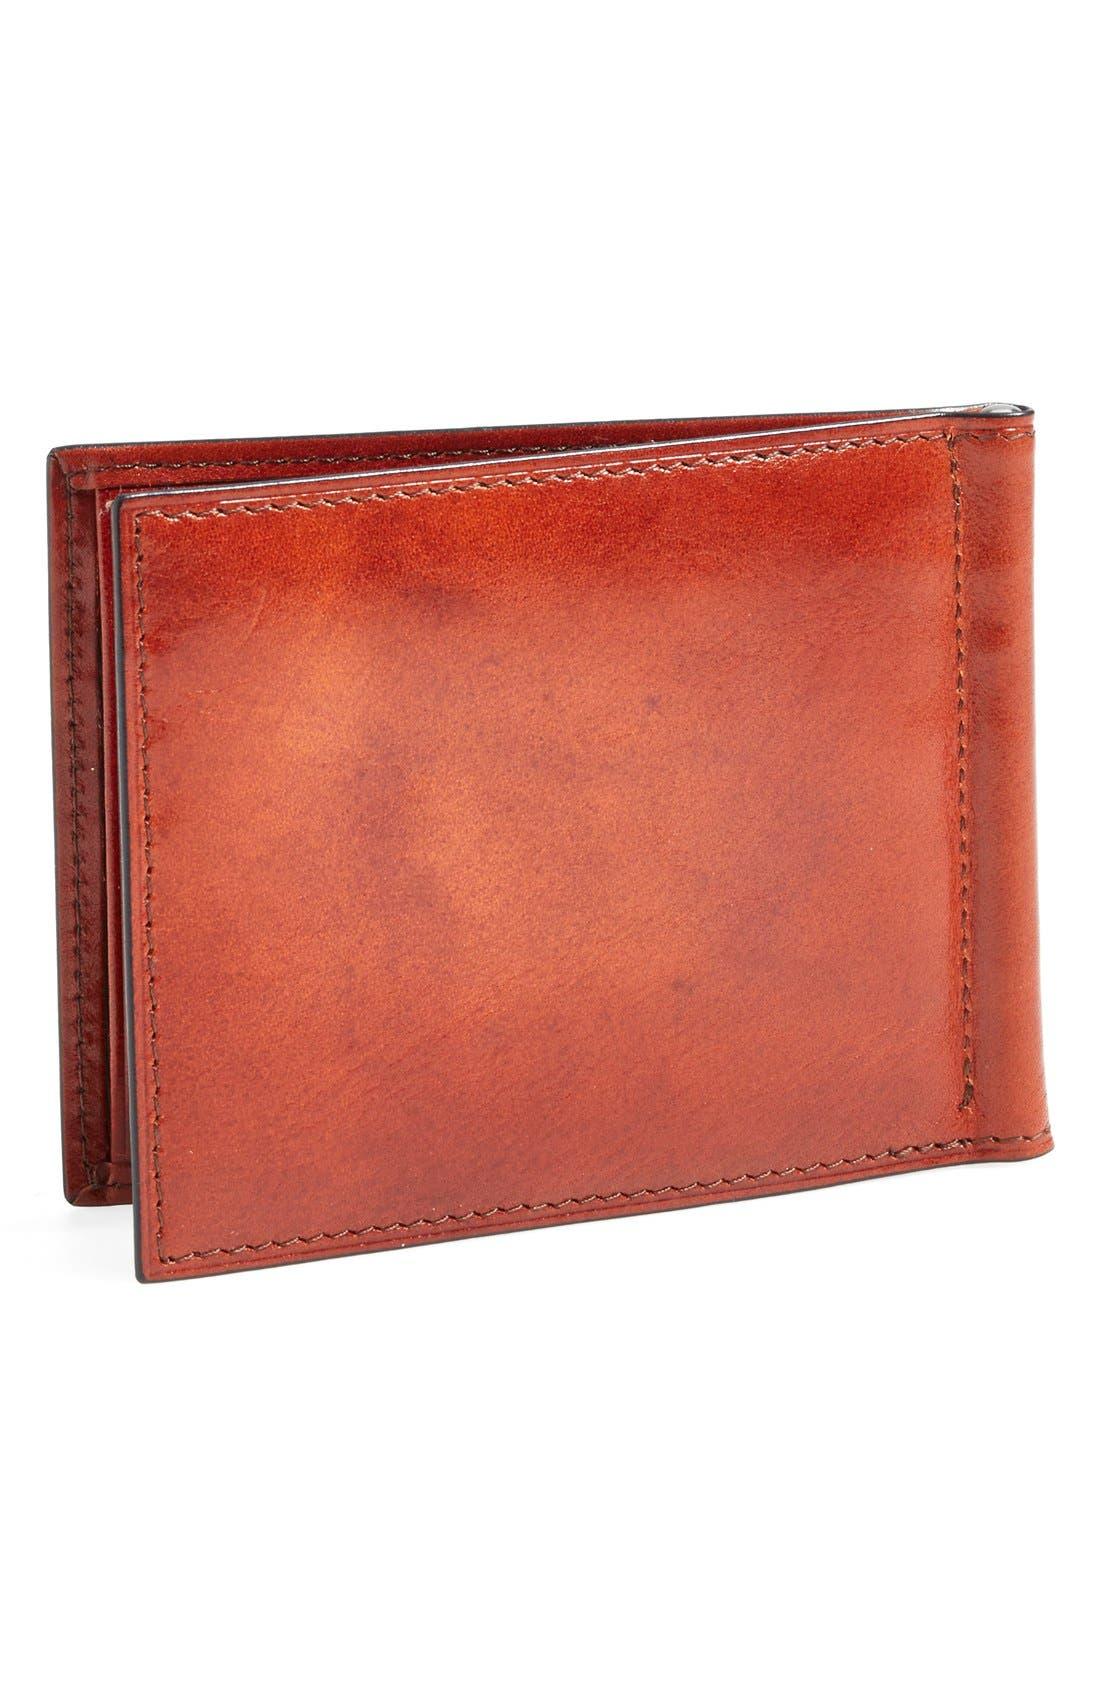 Alternate Image 3  - Bosca 'Old Leather' Bifold Wallet